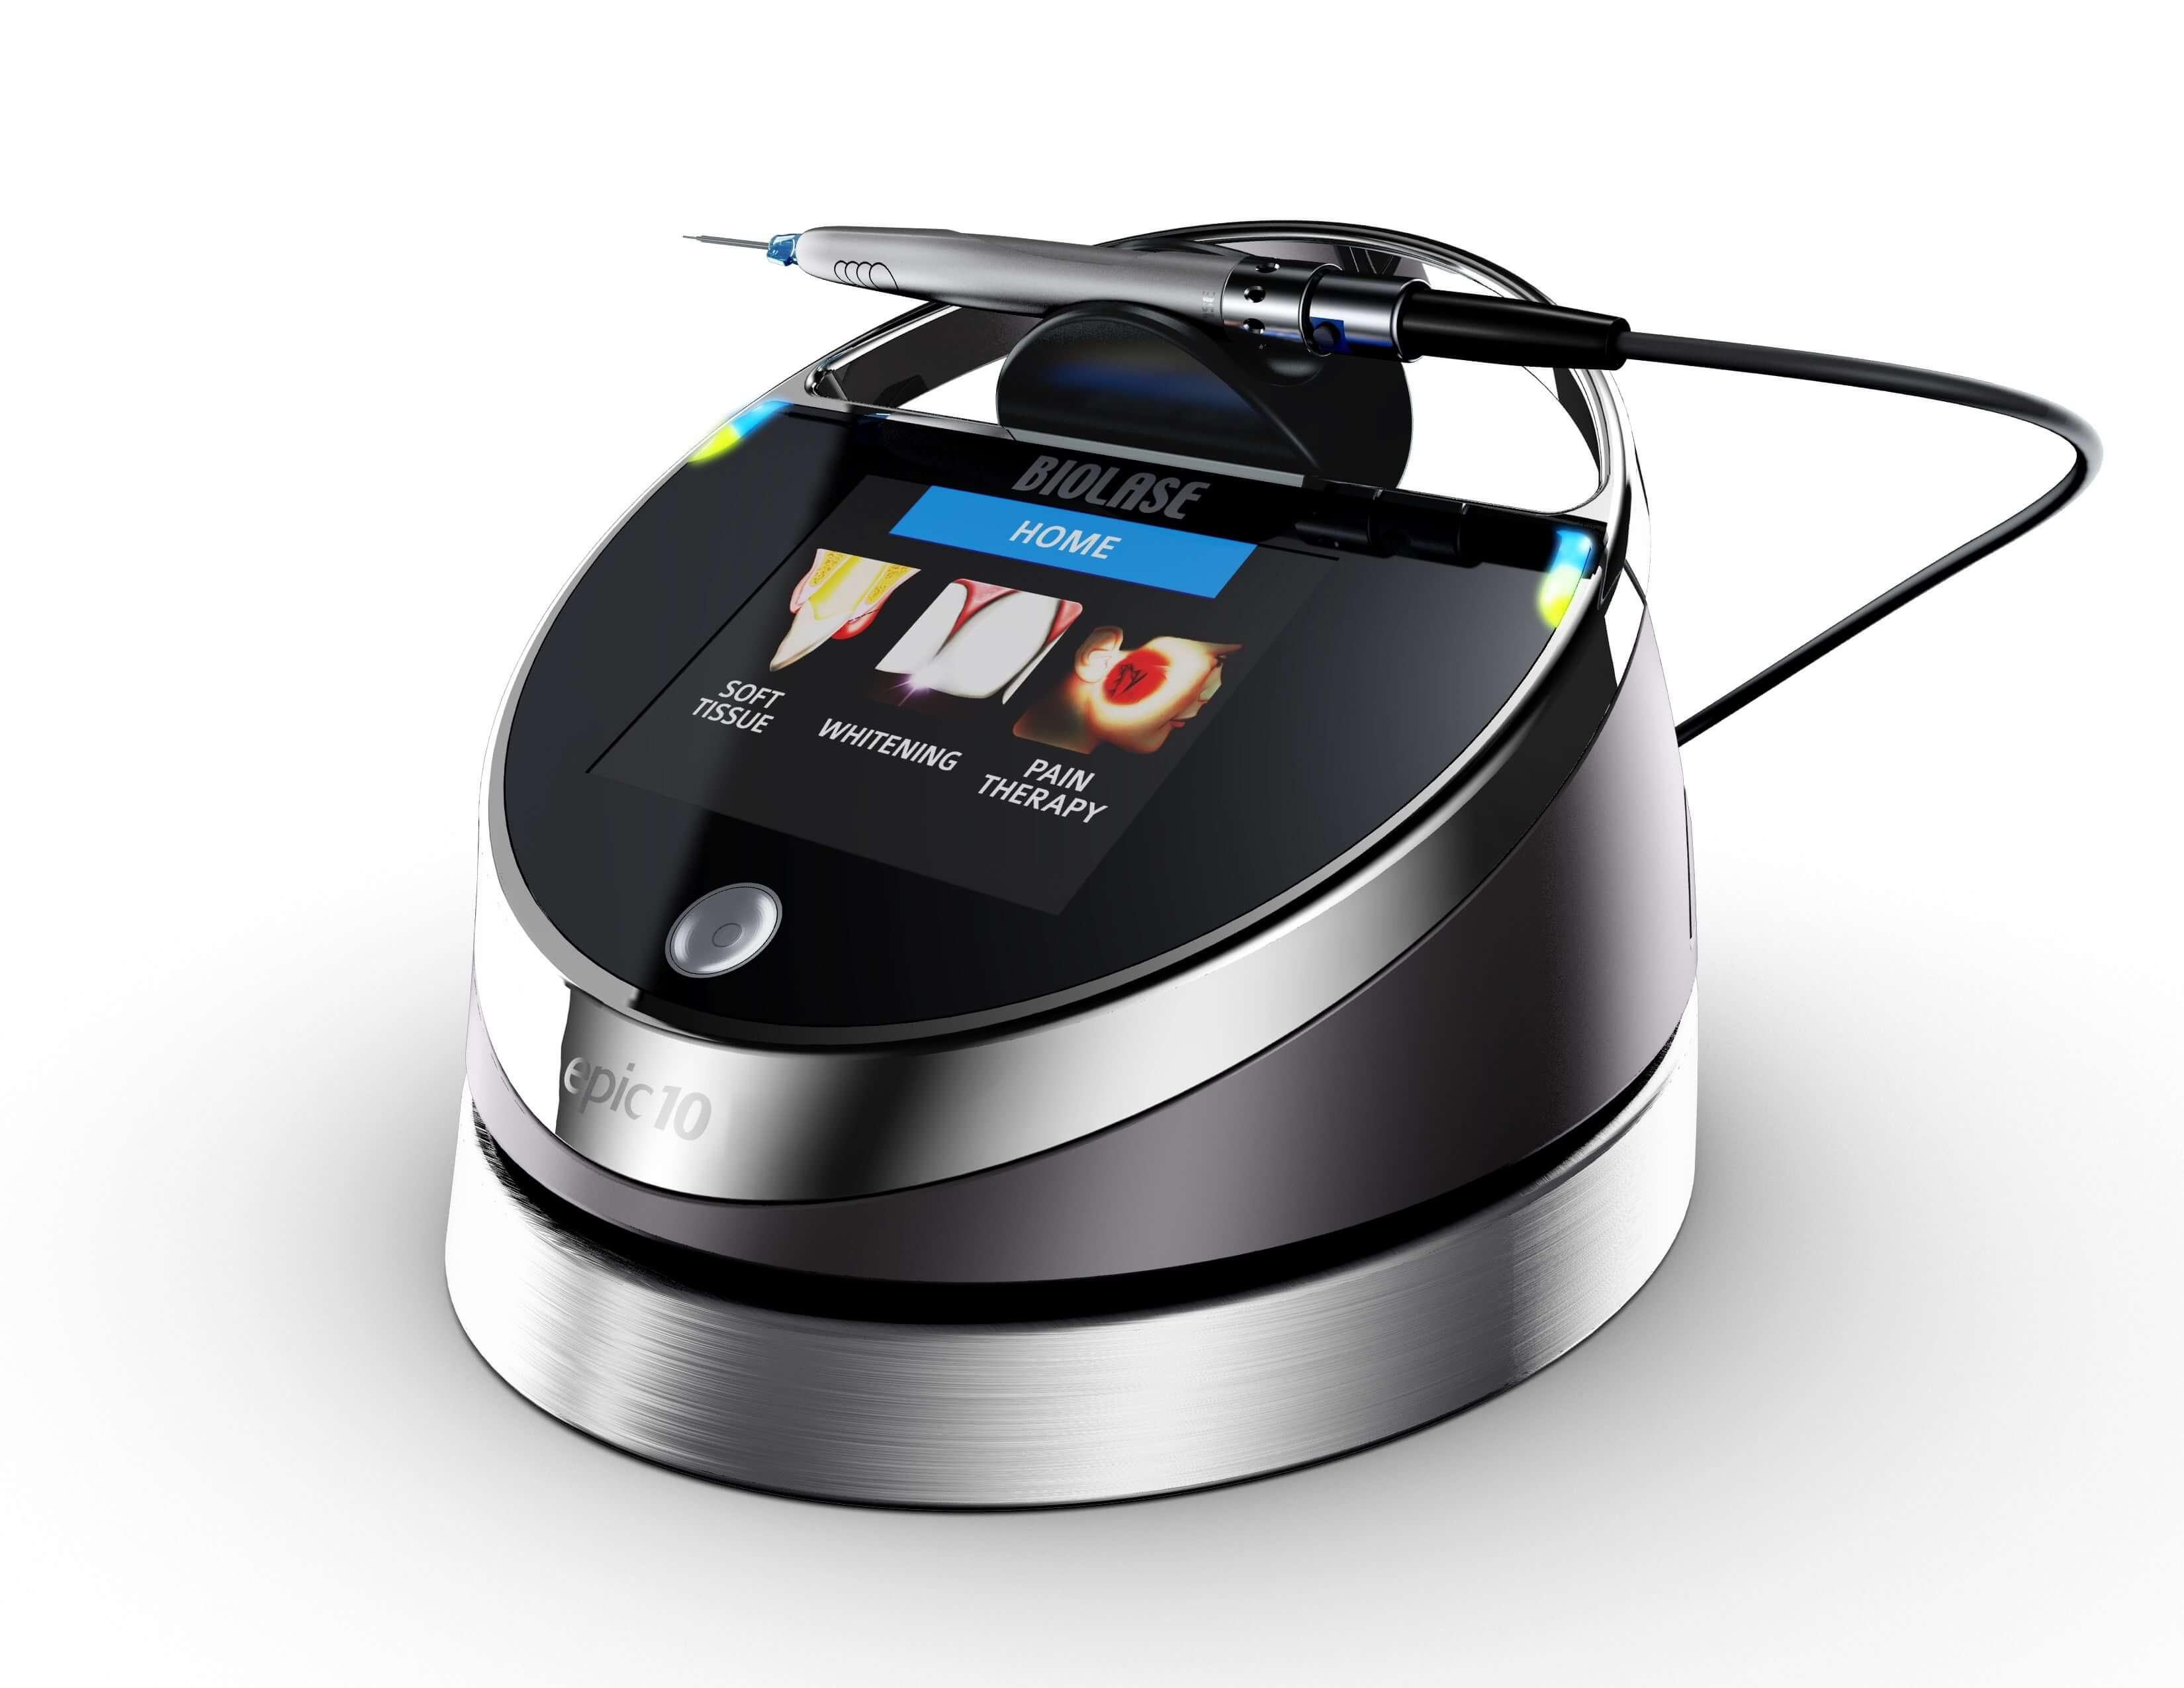 Primena Biolase lasera za uklanjanje plika i frenuluma.